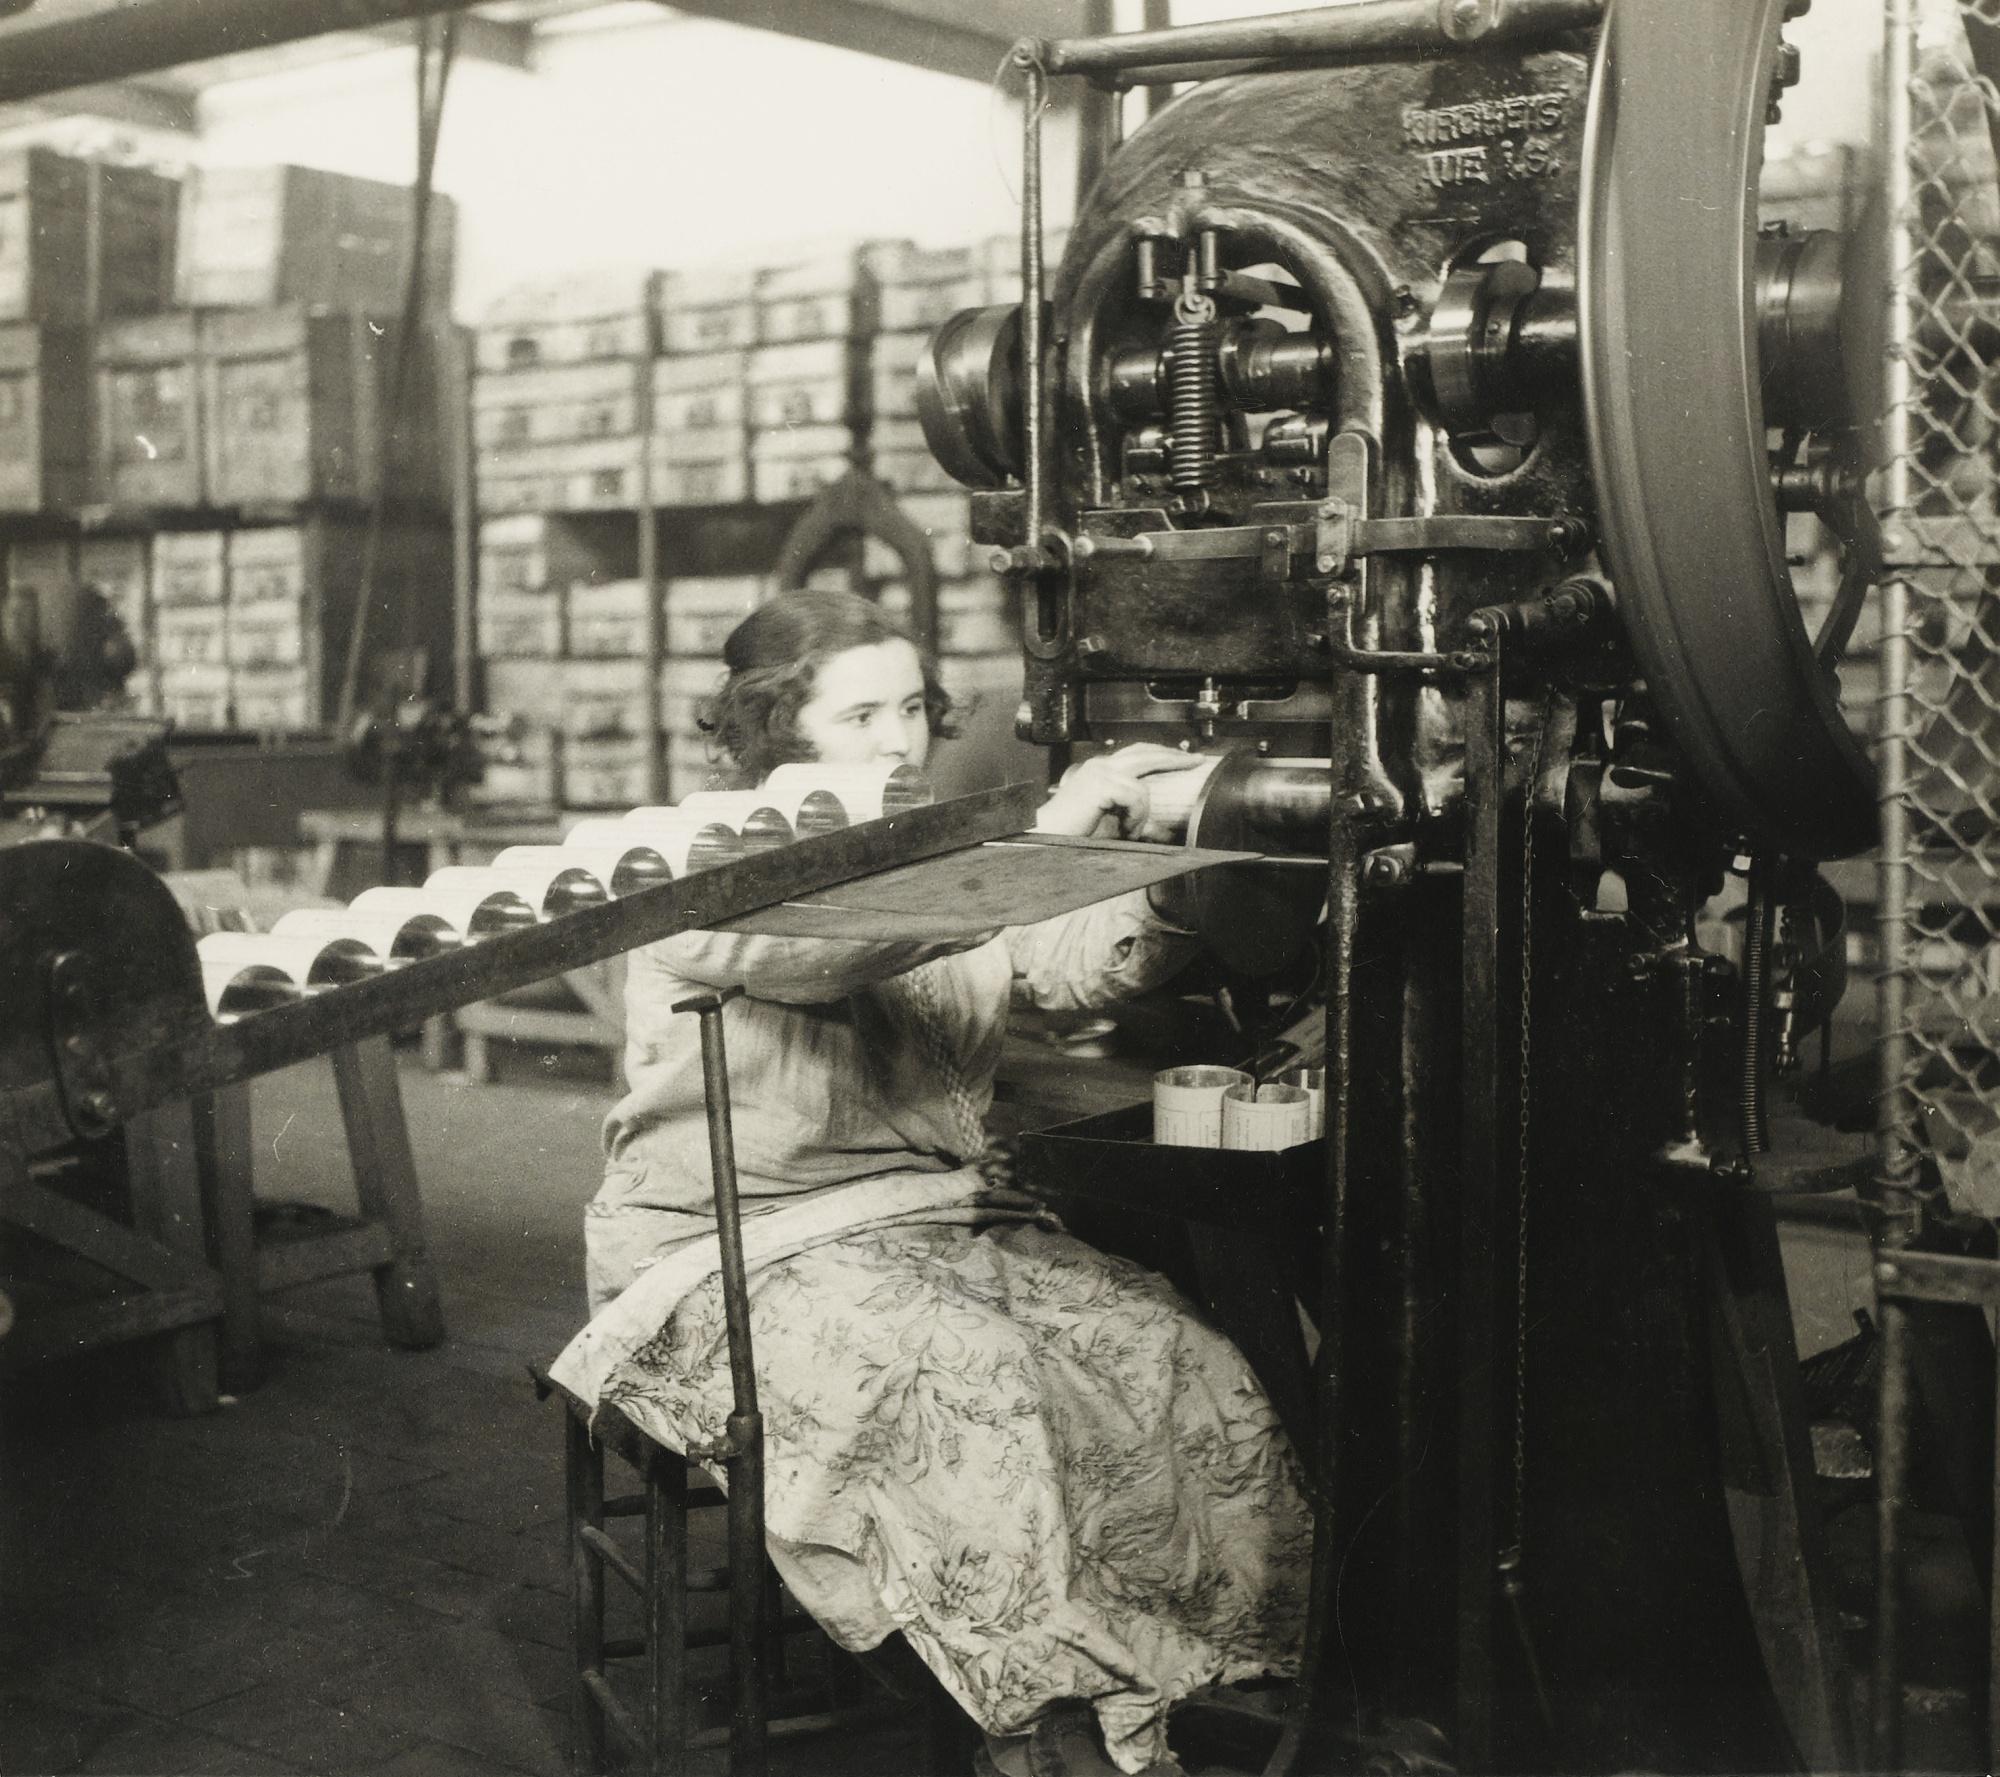 Germaine Krull-Femme A Lusine De Metal Vers-1925